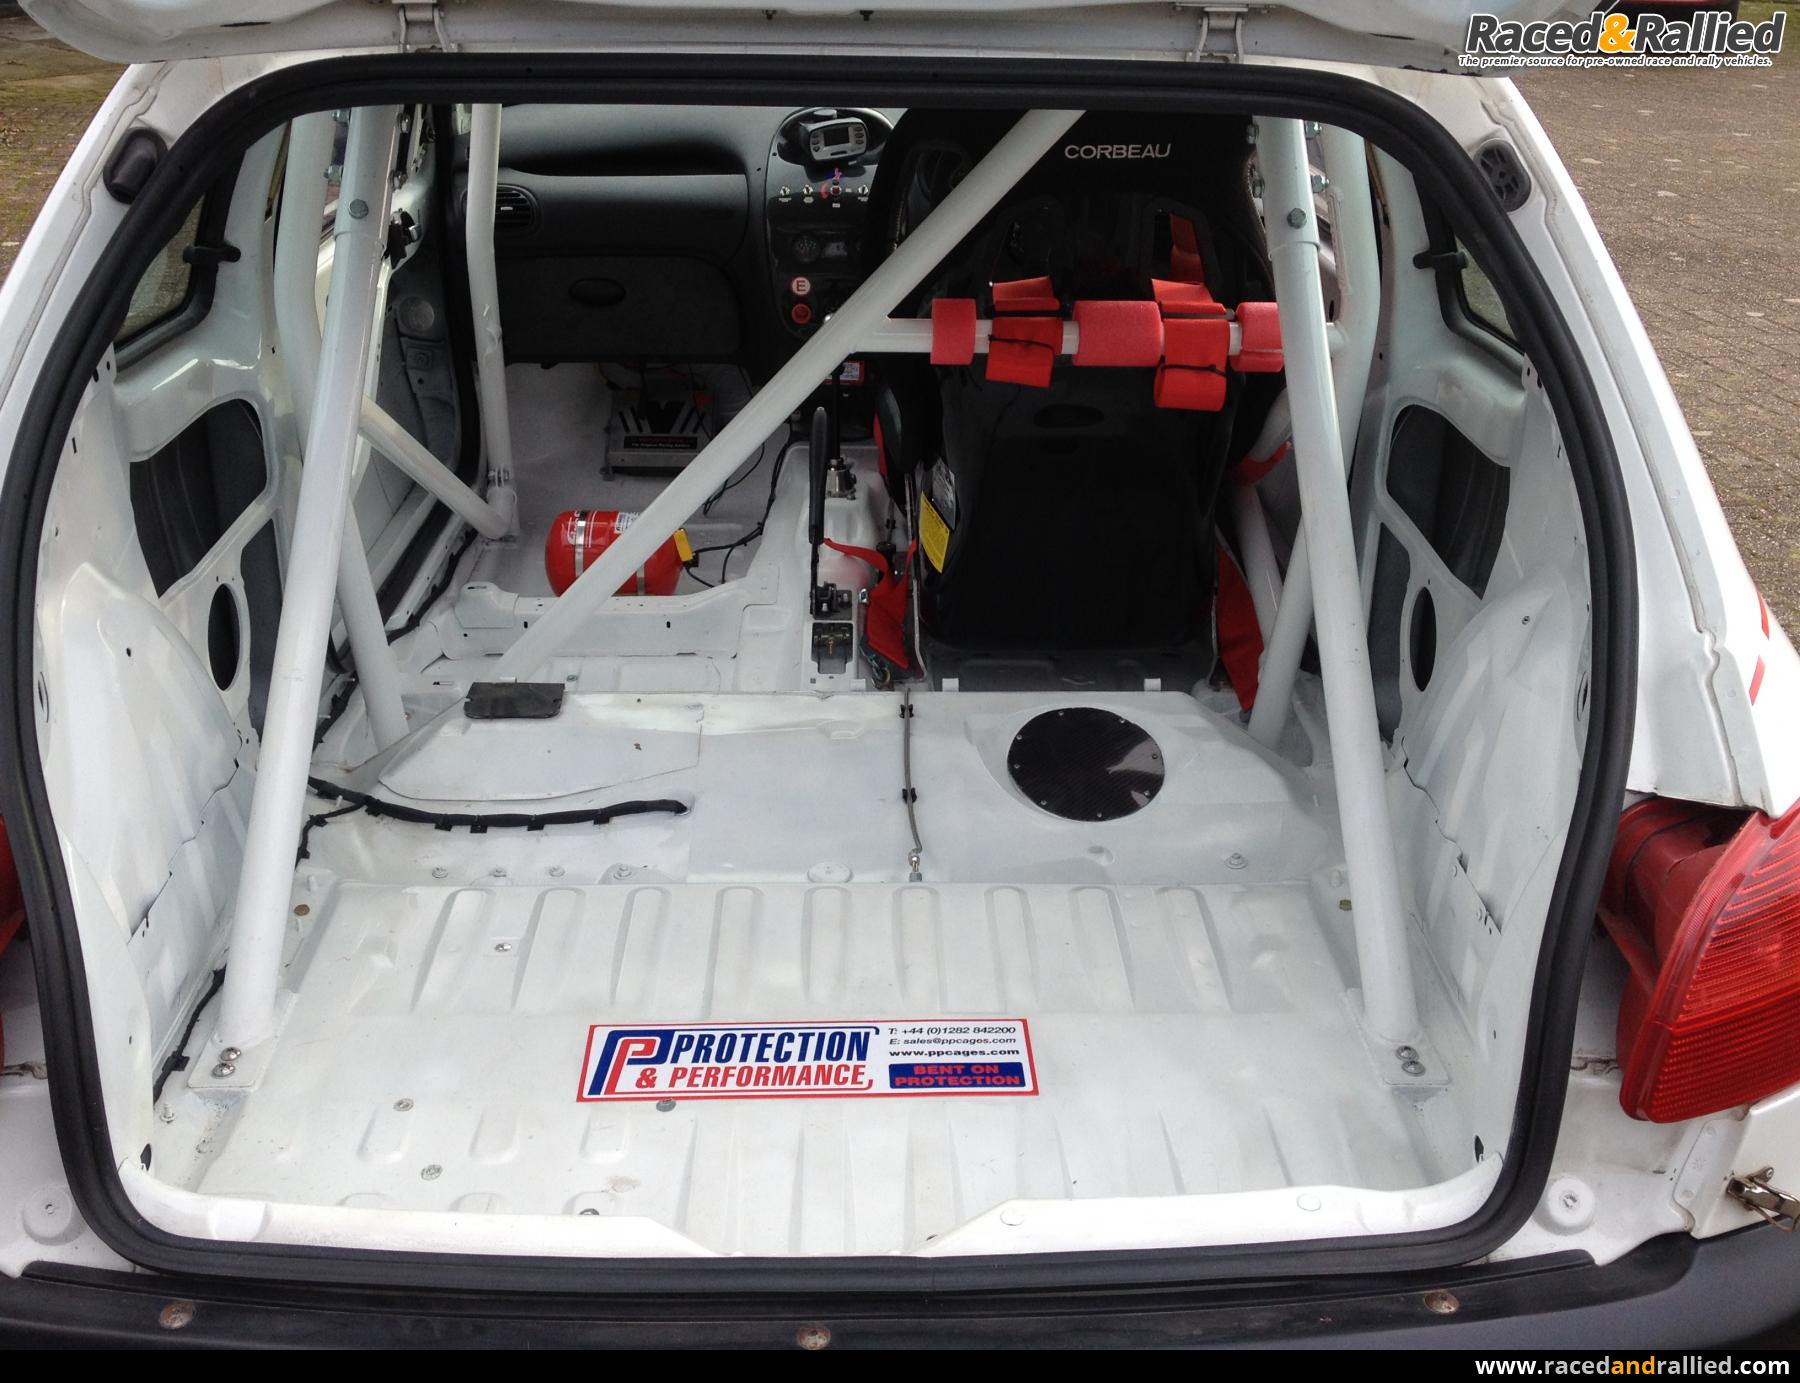 Peugeot 206 Race car,Rally,Sprint/hillclimb, Track 274 BHP | Race ...